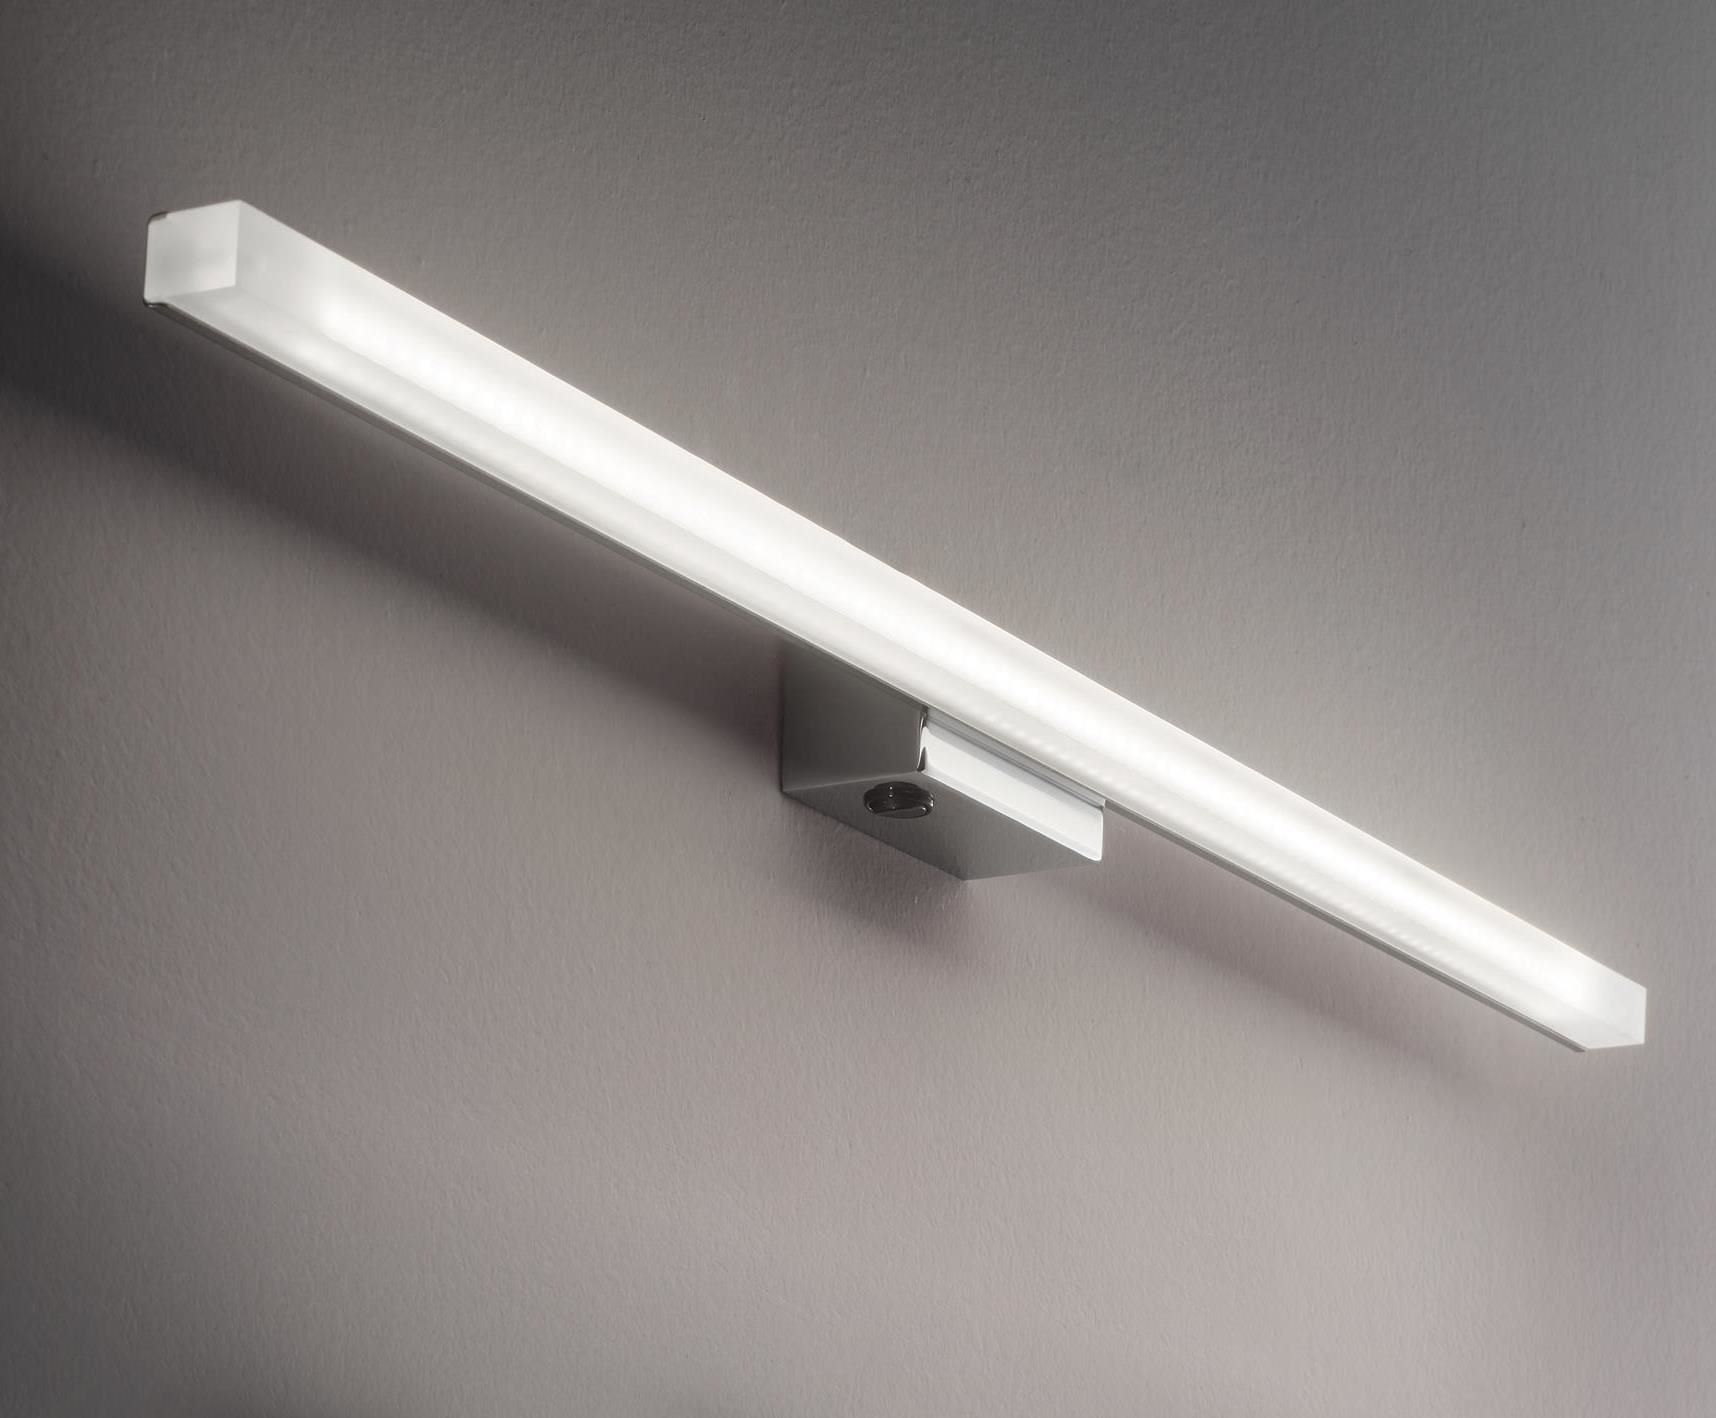 Ideal Lux LED Spiegelleuchte Line Chrom